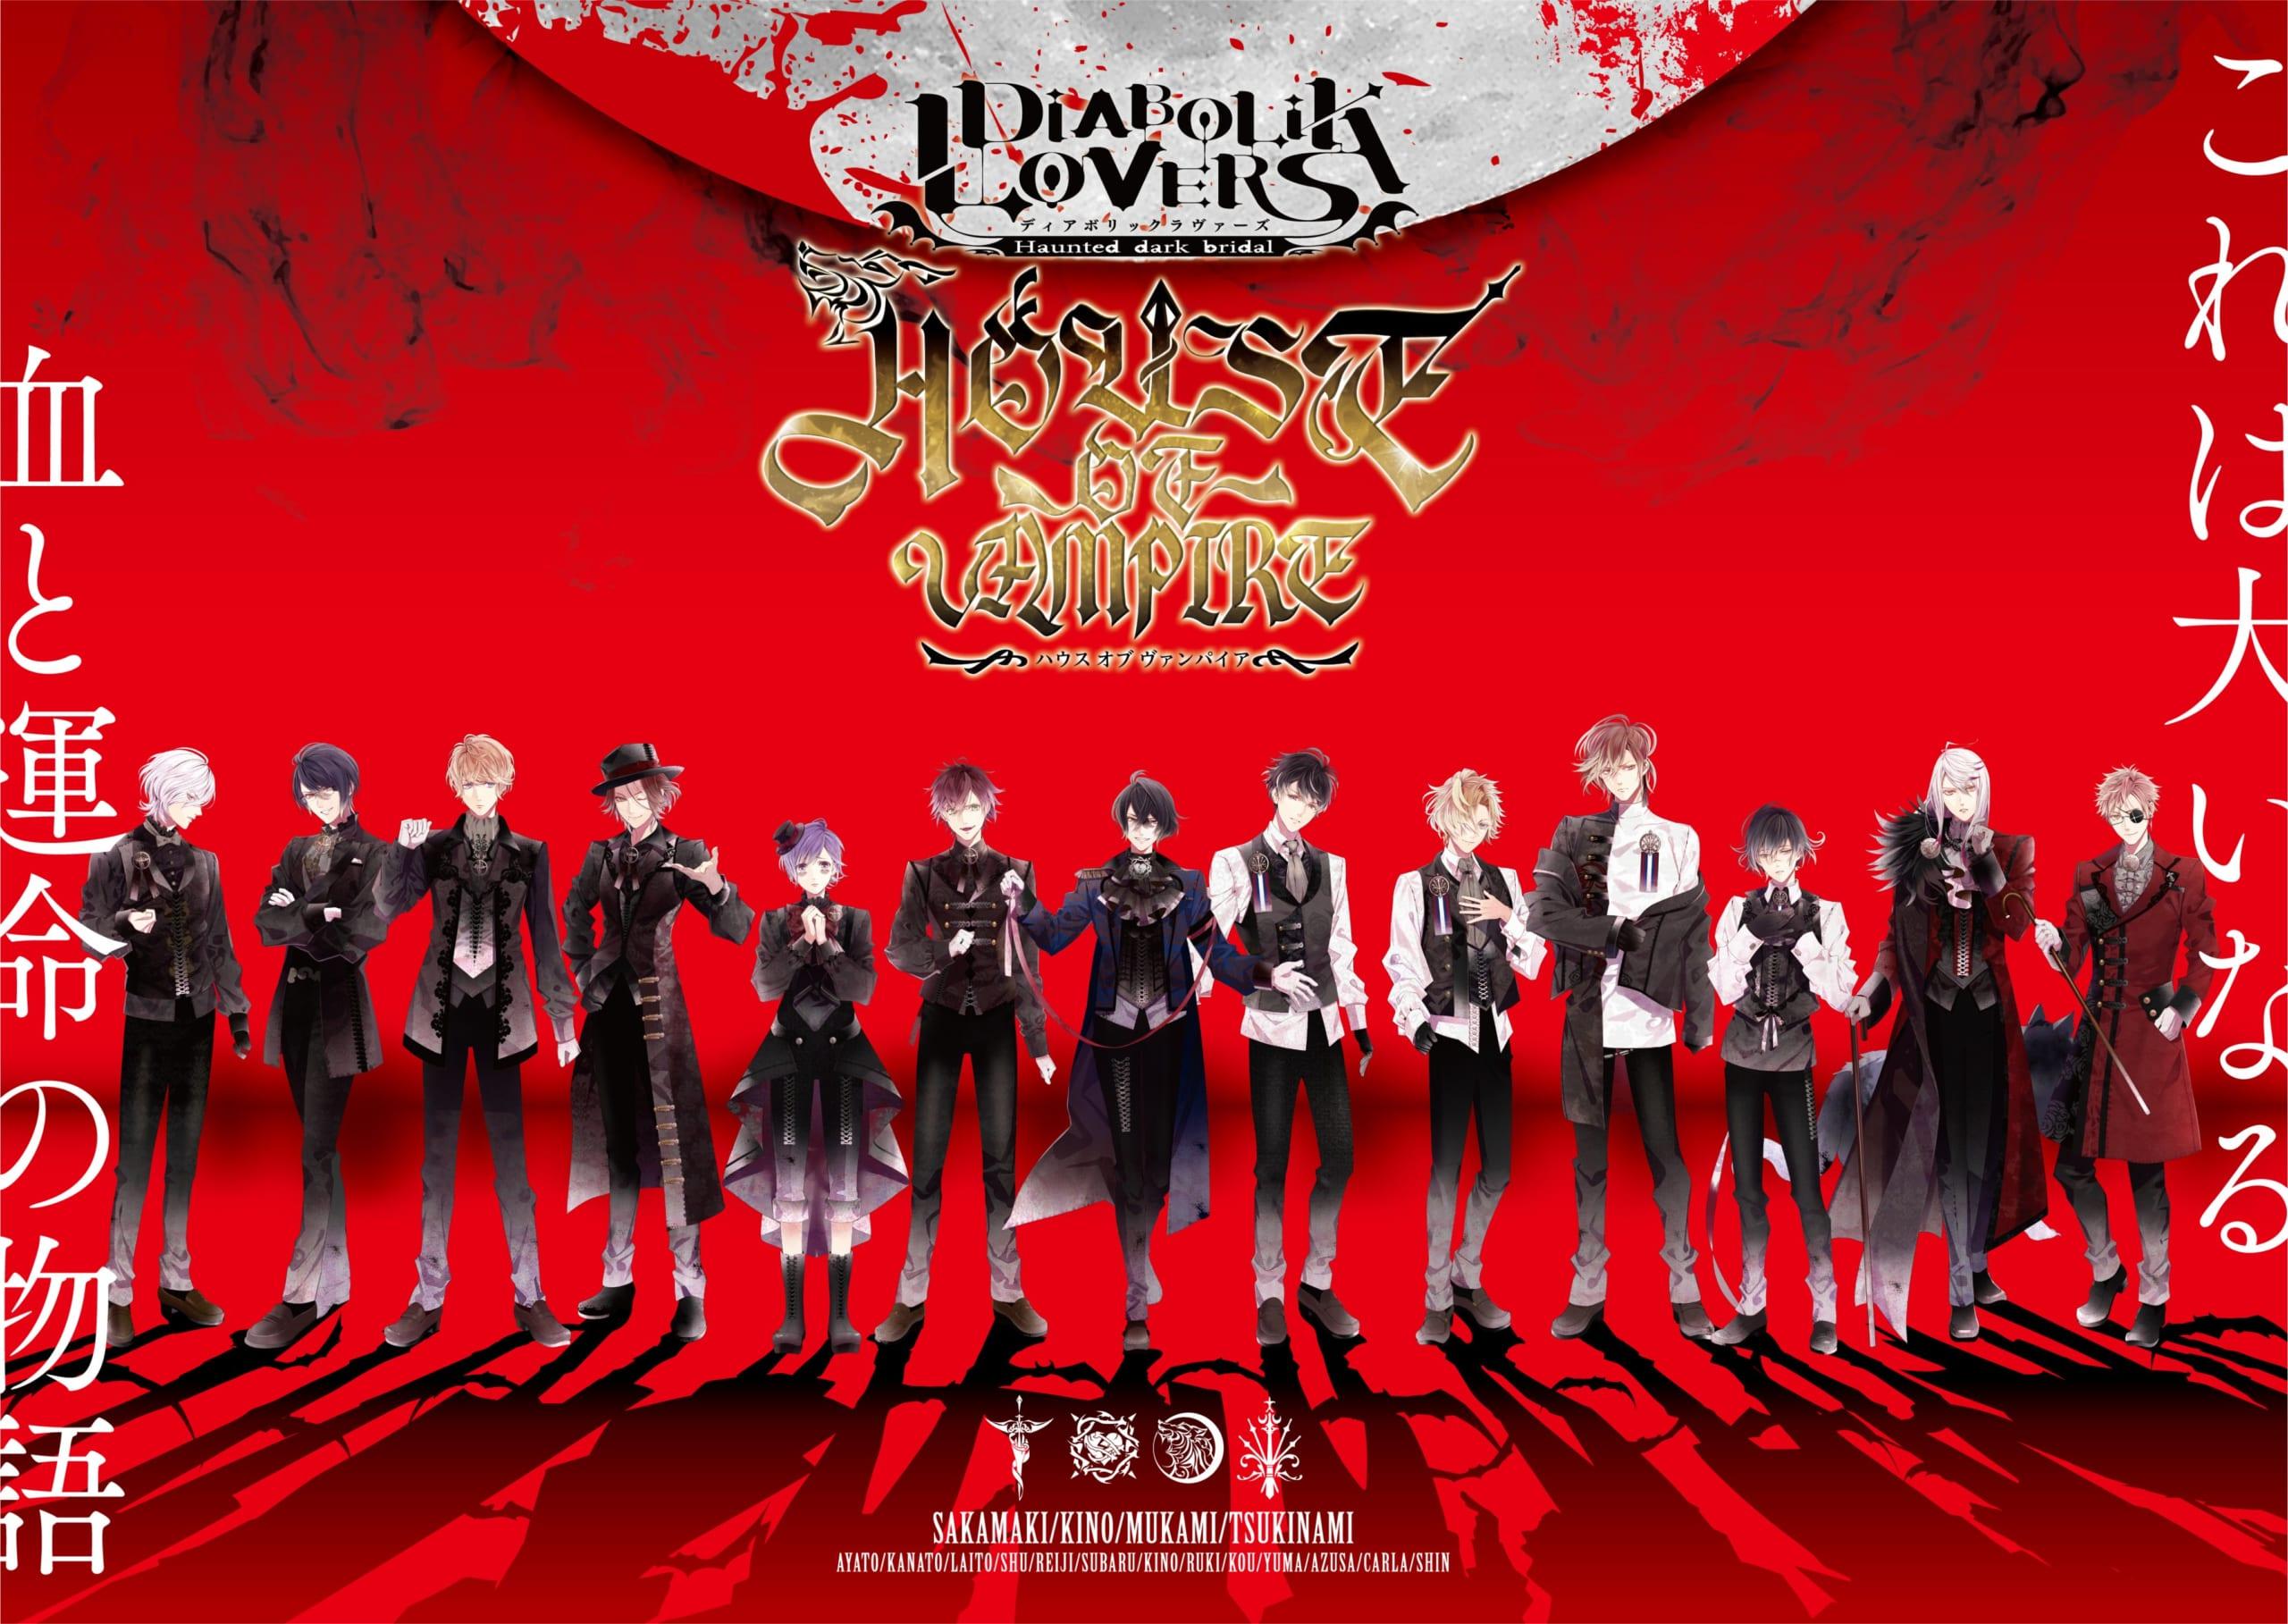 「DIABOLIK LOVERS」新作ドラマCD&キャラソン「HOUSE OF VAMPIRE」全3巻が発売決定!